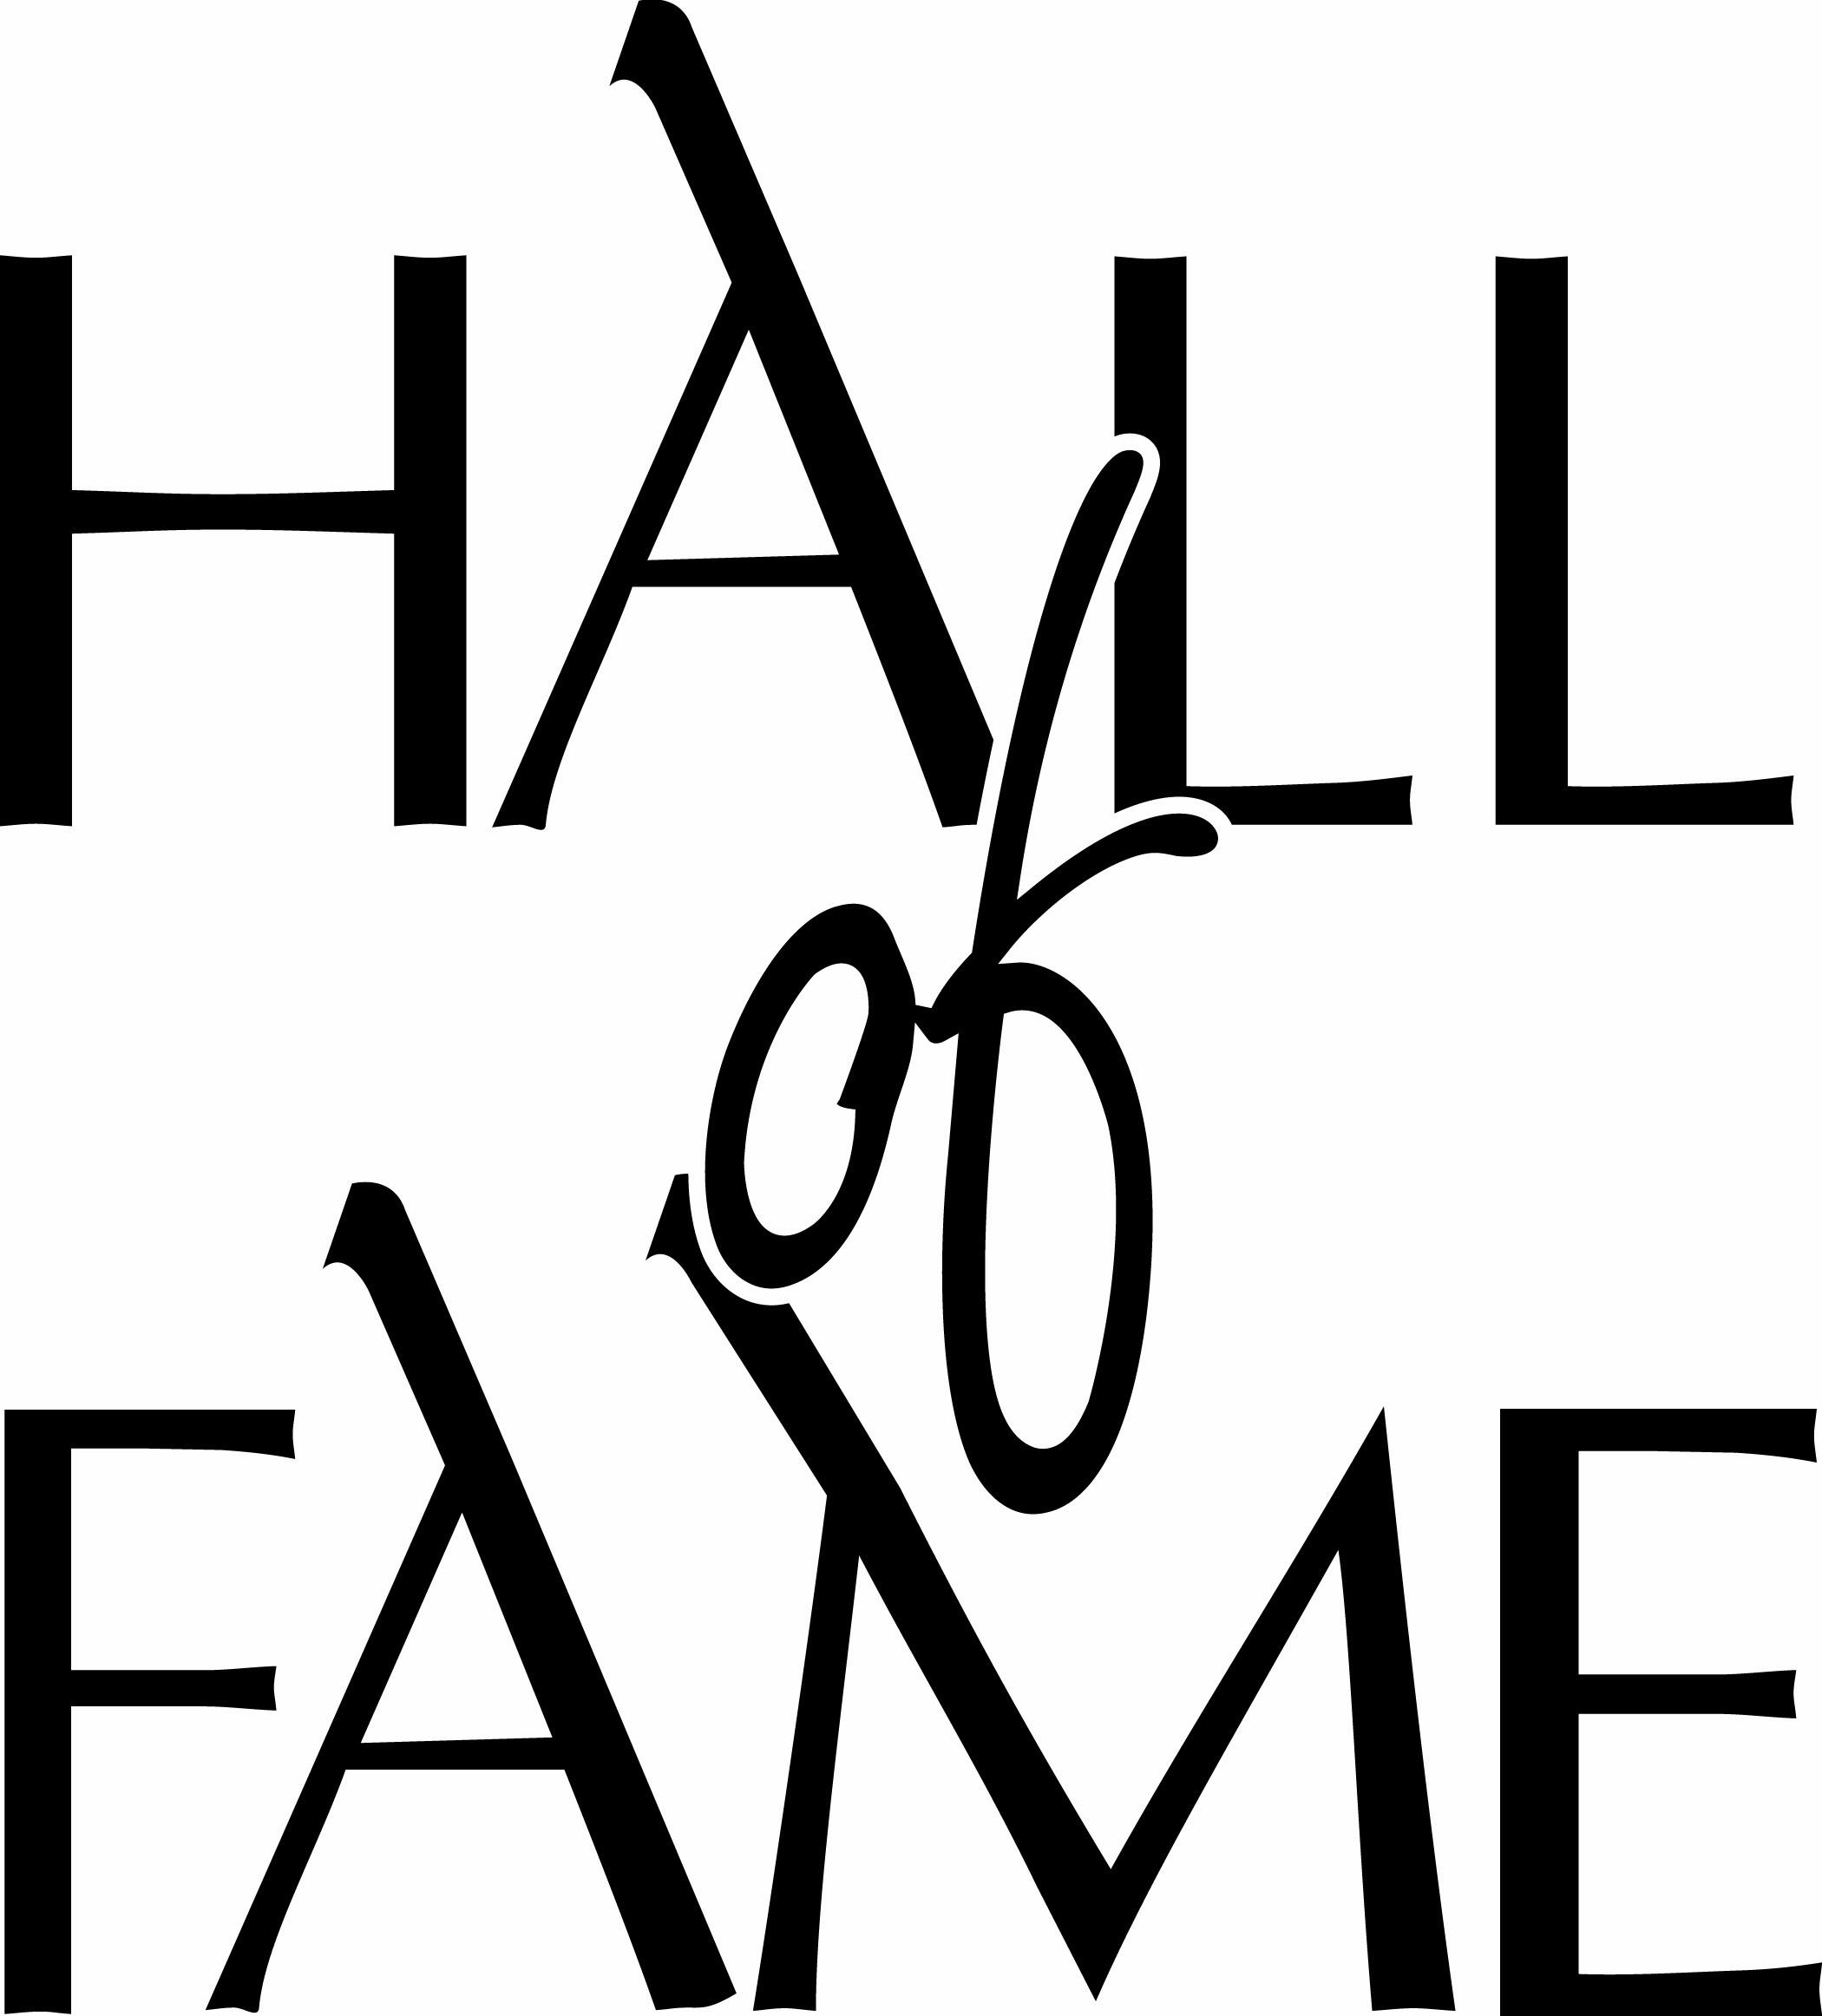 hall-of-fame-logo.jpg